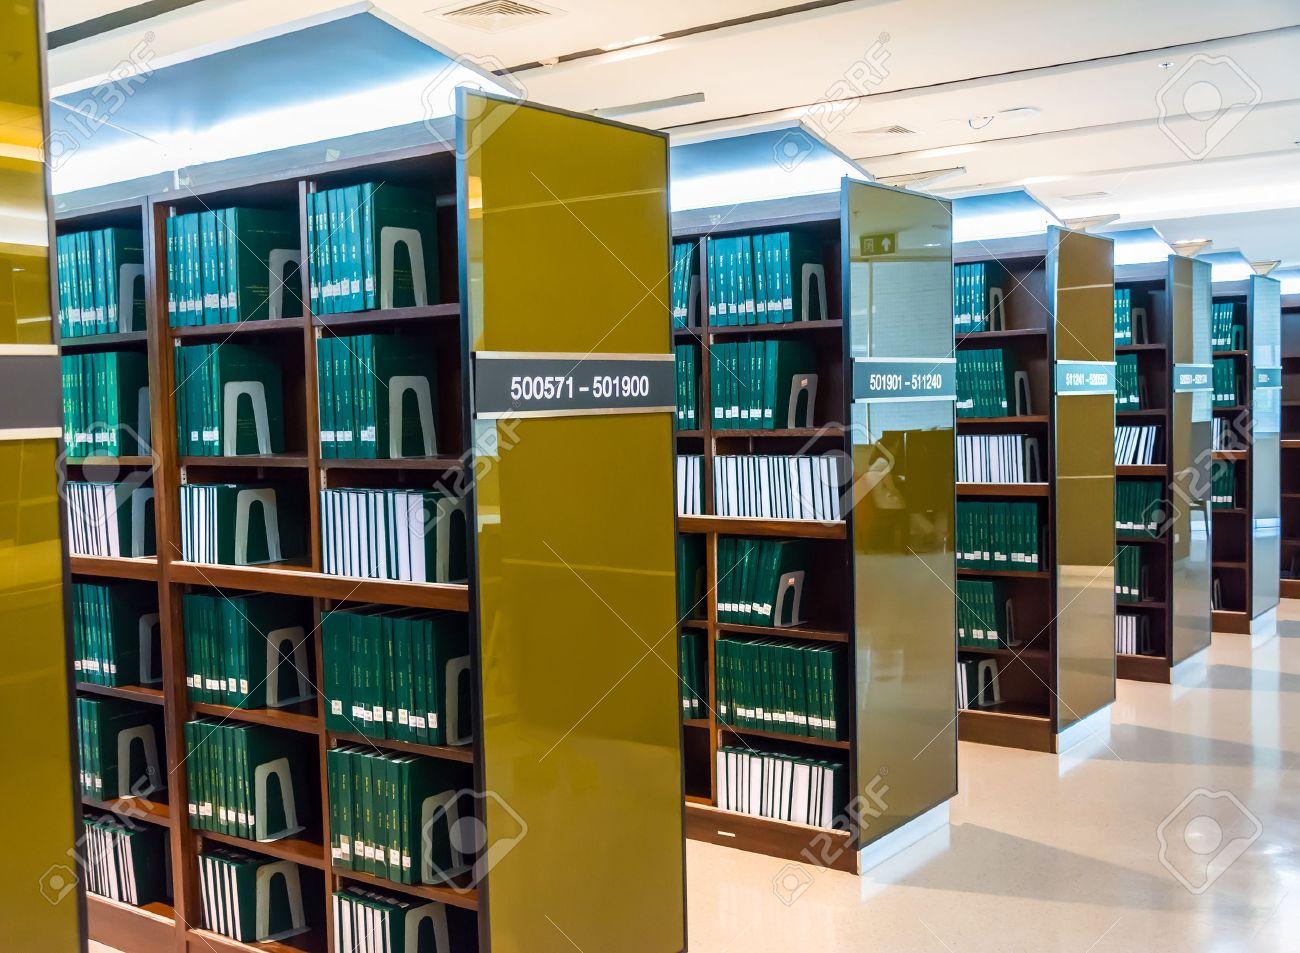 Library books shelf green.